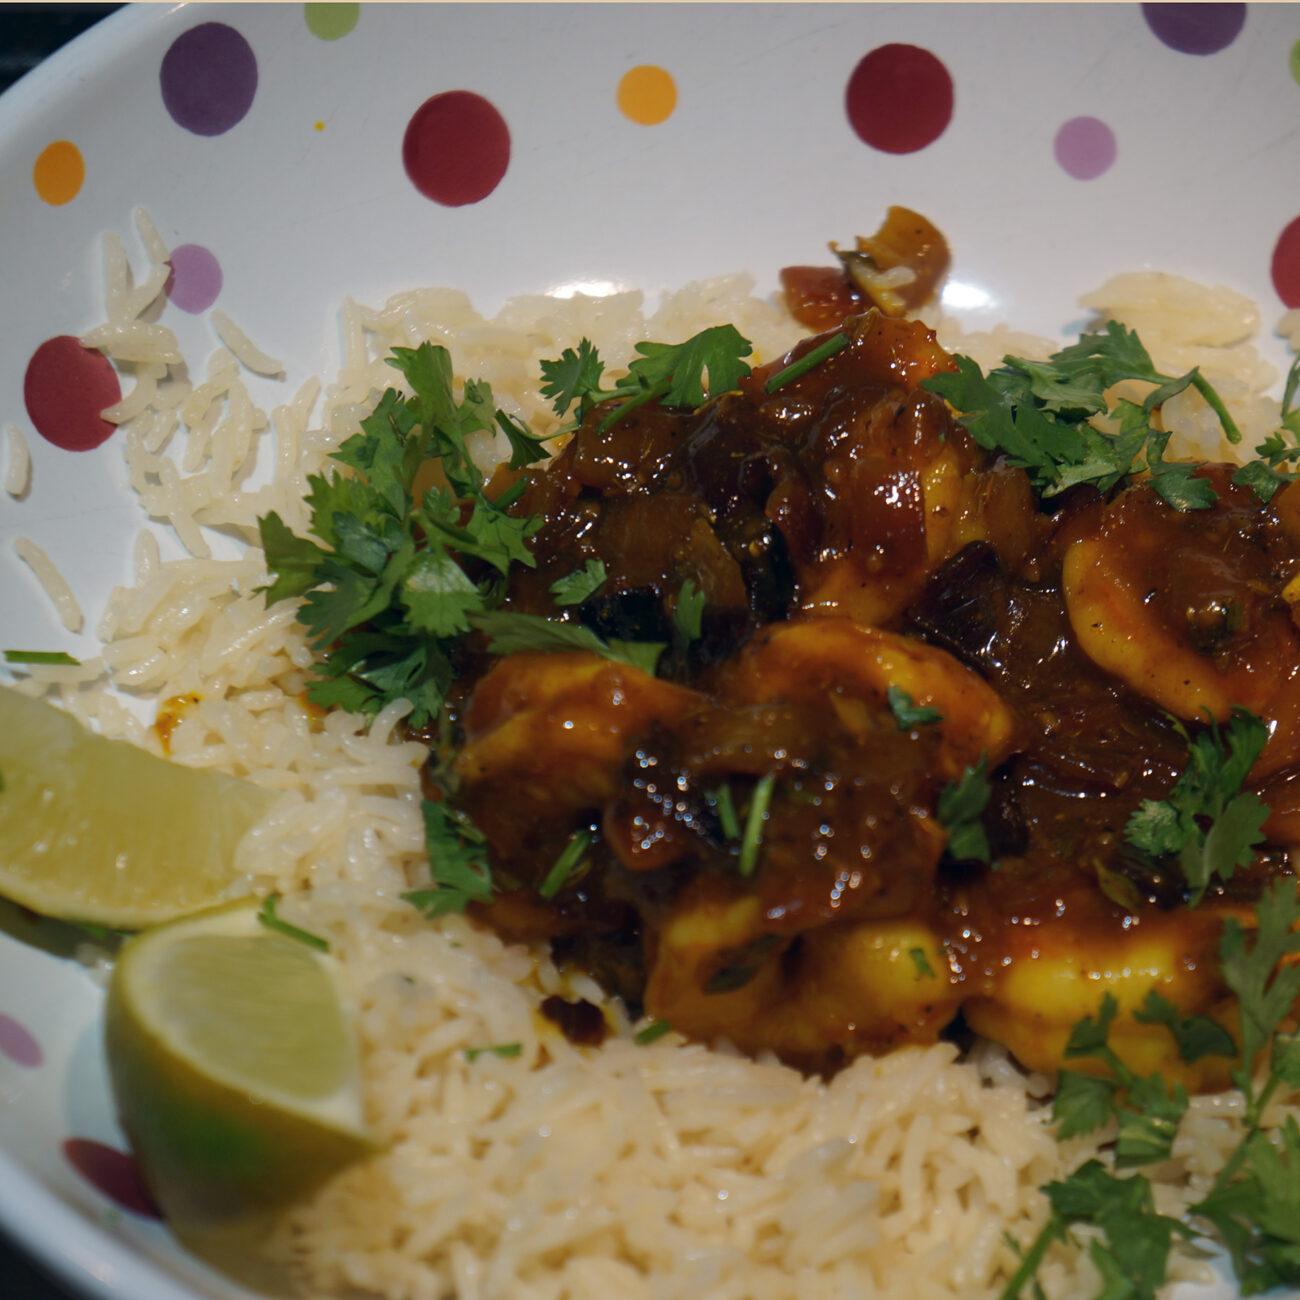 Spicy Coconut Shrimp with Turmeric